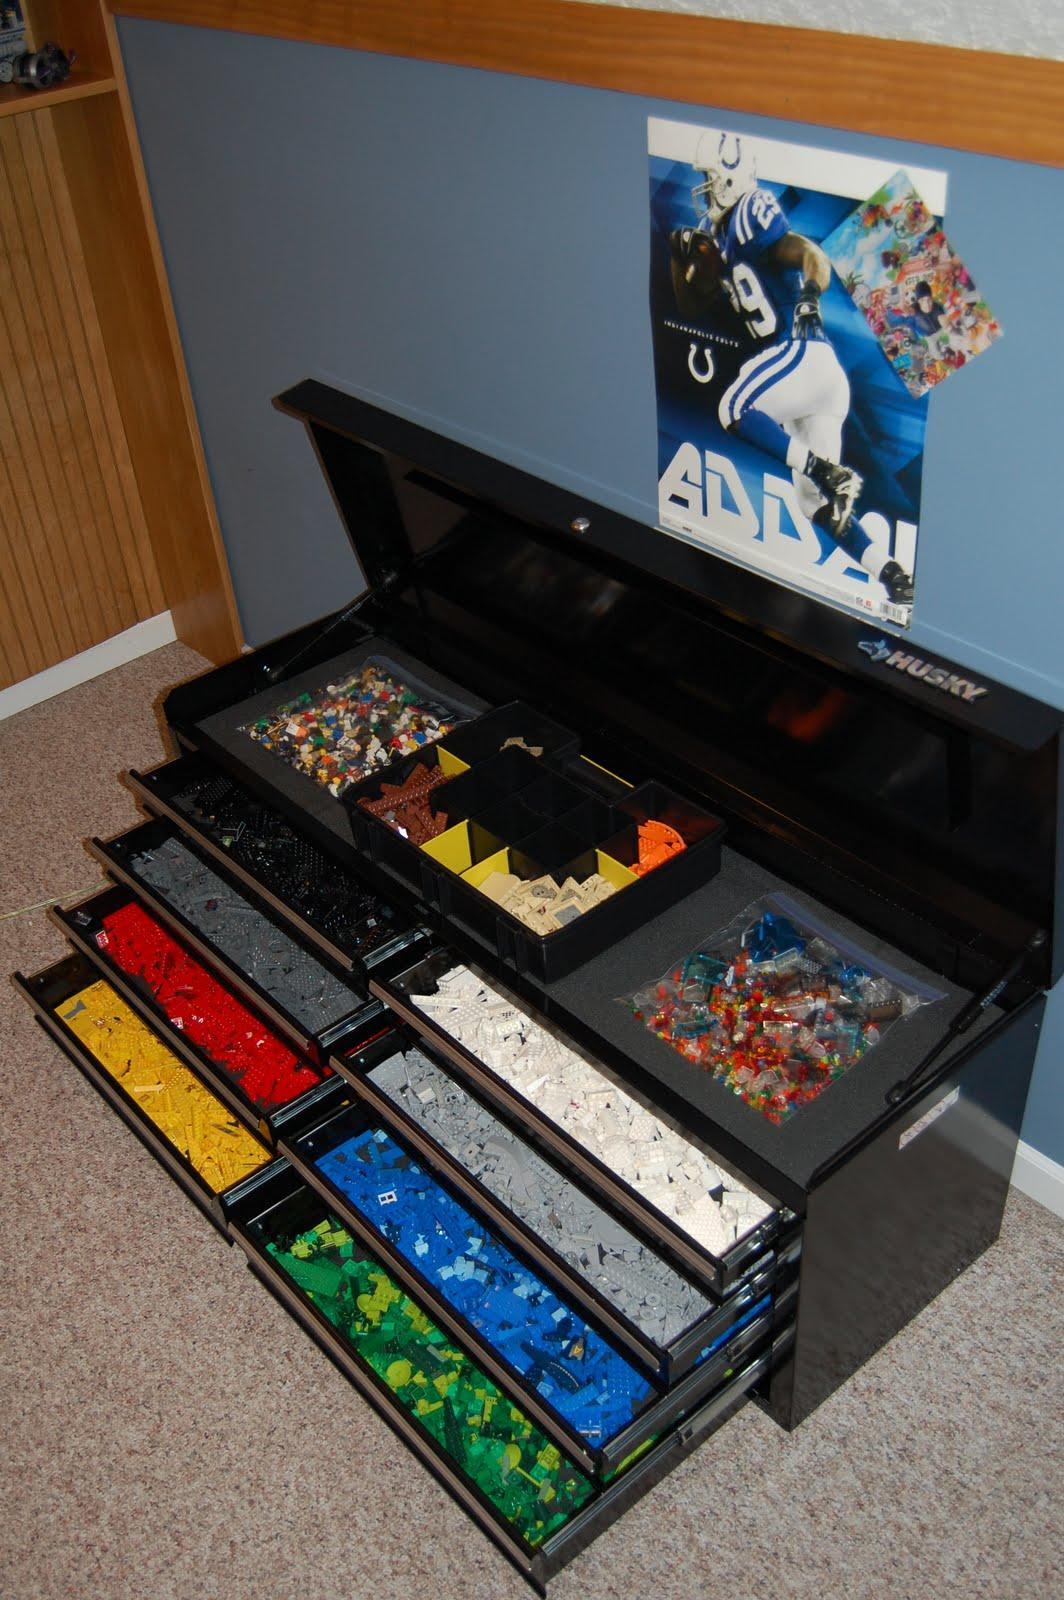 Lego Organising and Storage 2   Stay at Home Mum.com.au